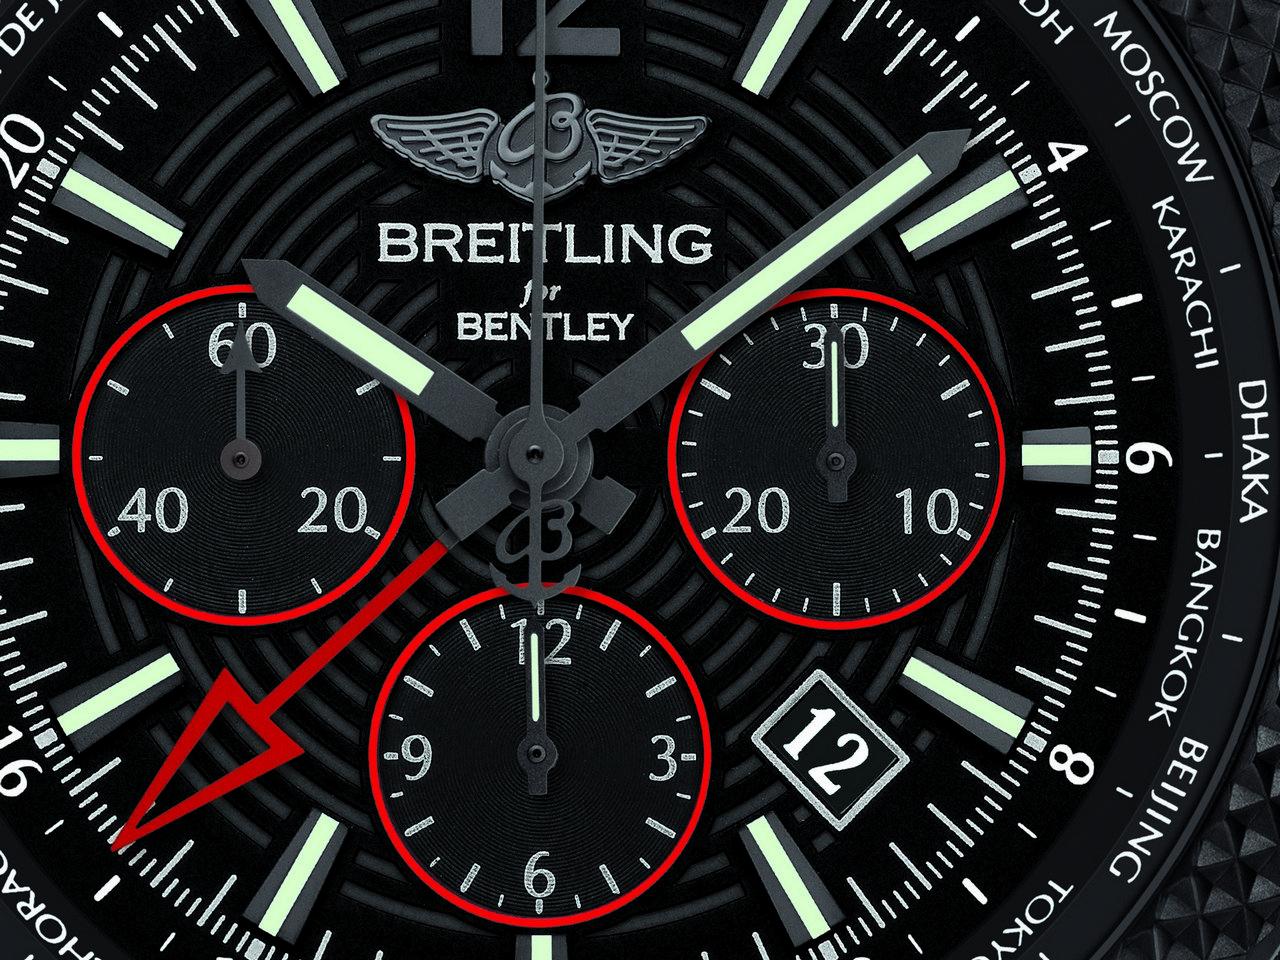 baselworld_2015-breitling-bentey-0-100_8